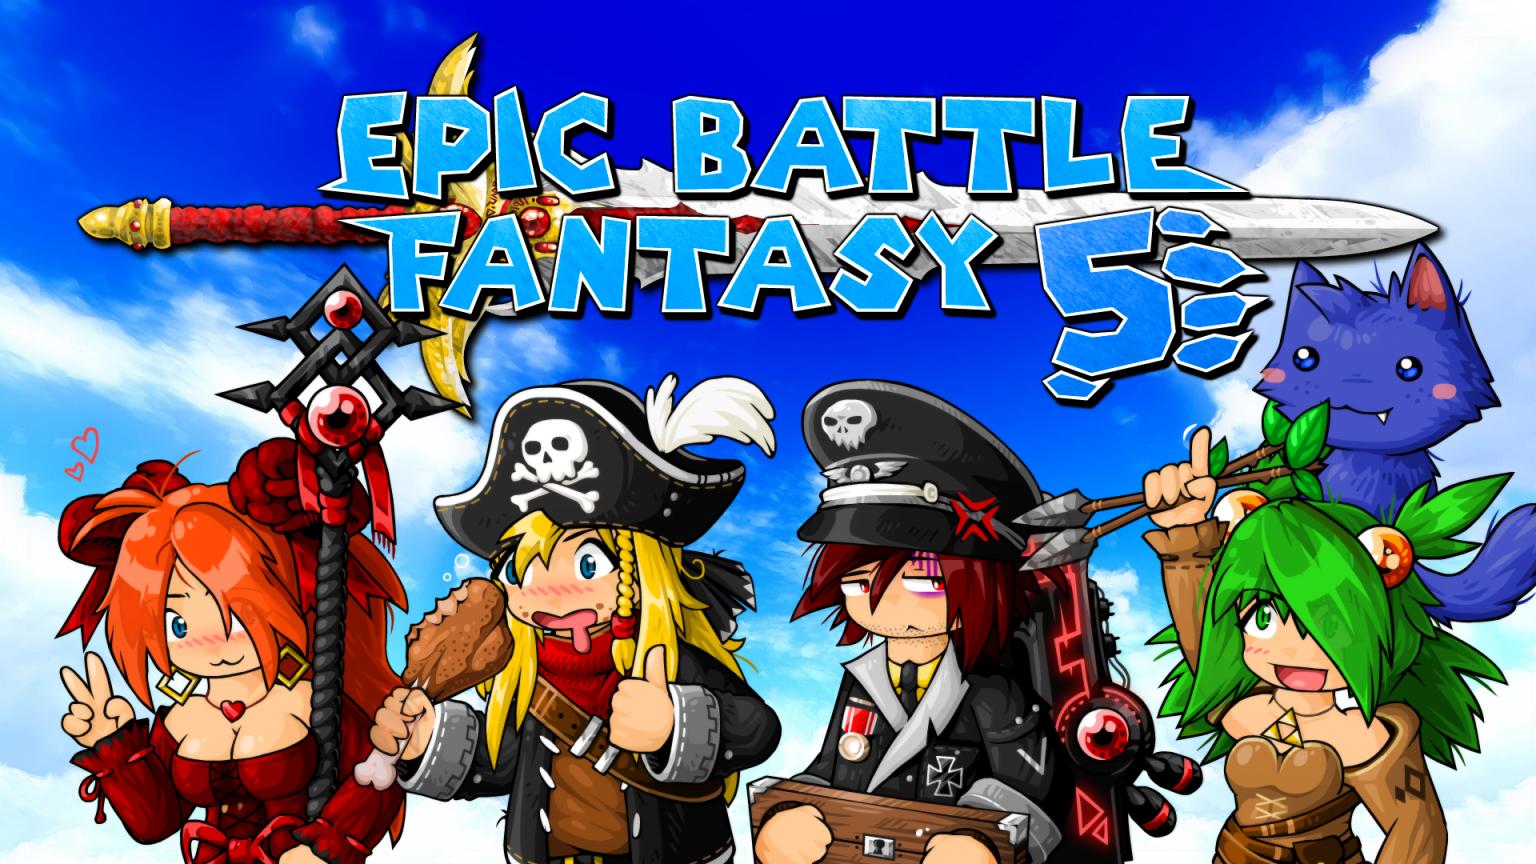 Epic Battle Fantasy 5 Full Mobile Game Free Download